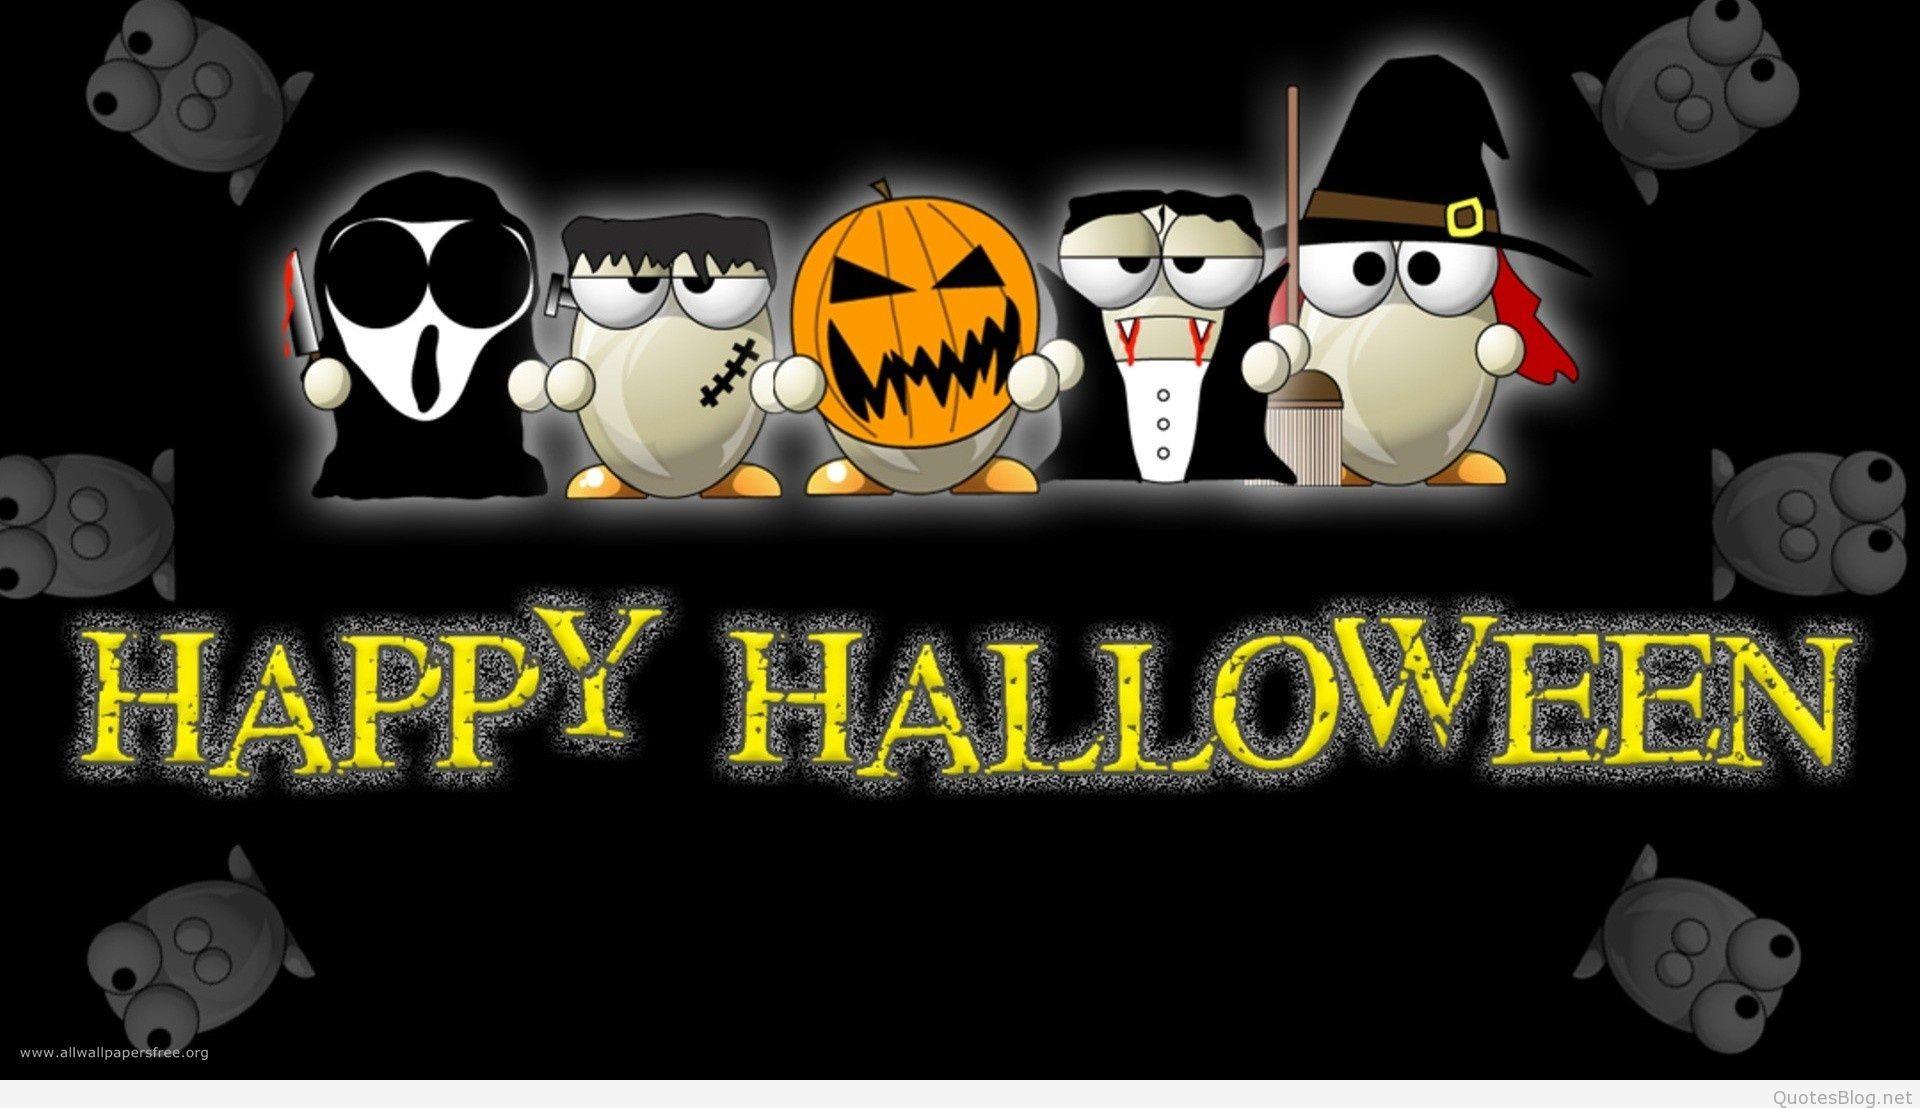 happy halloween backgrounds (69+ images)